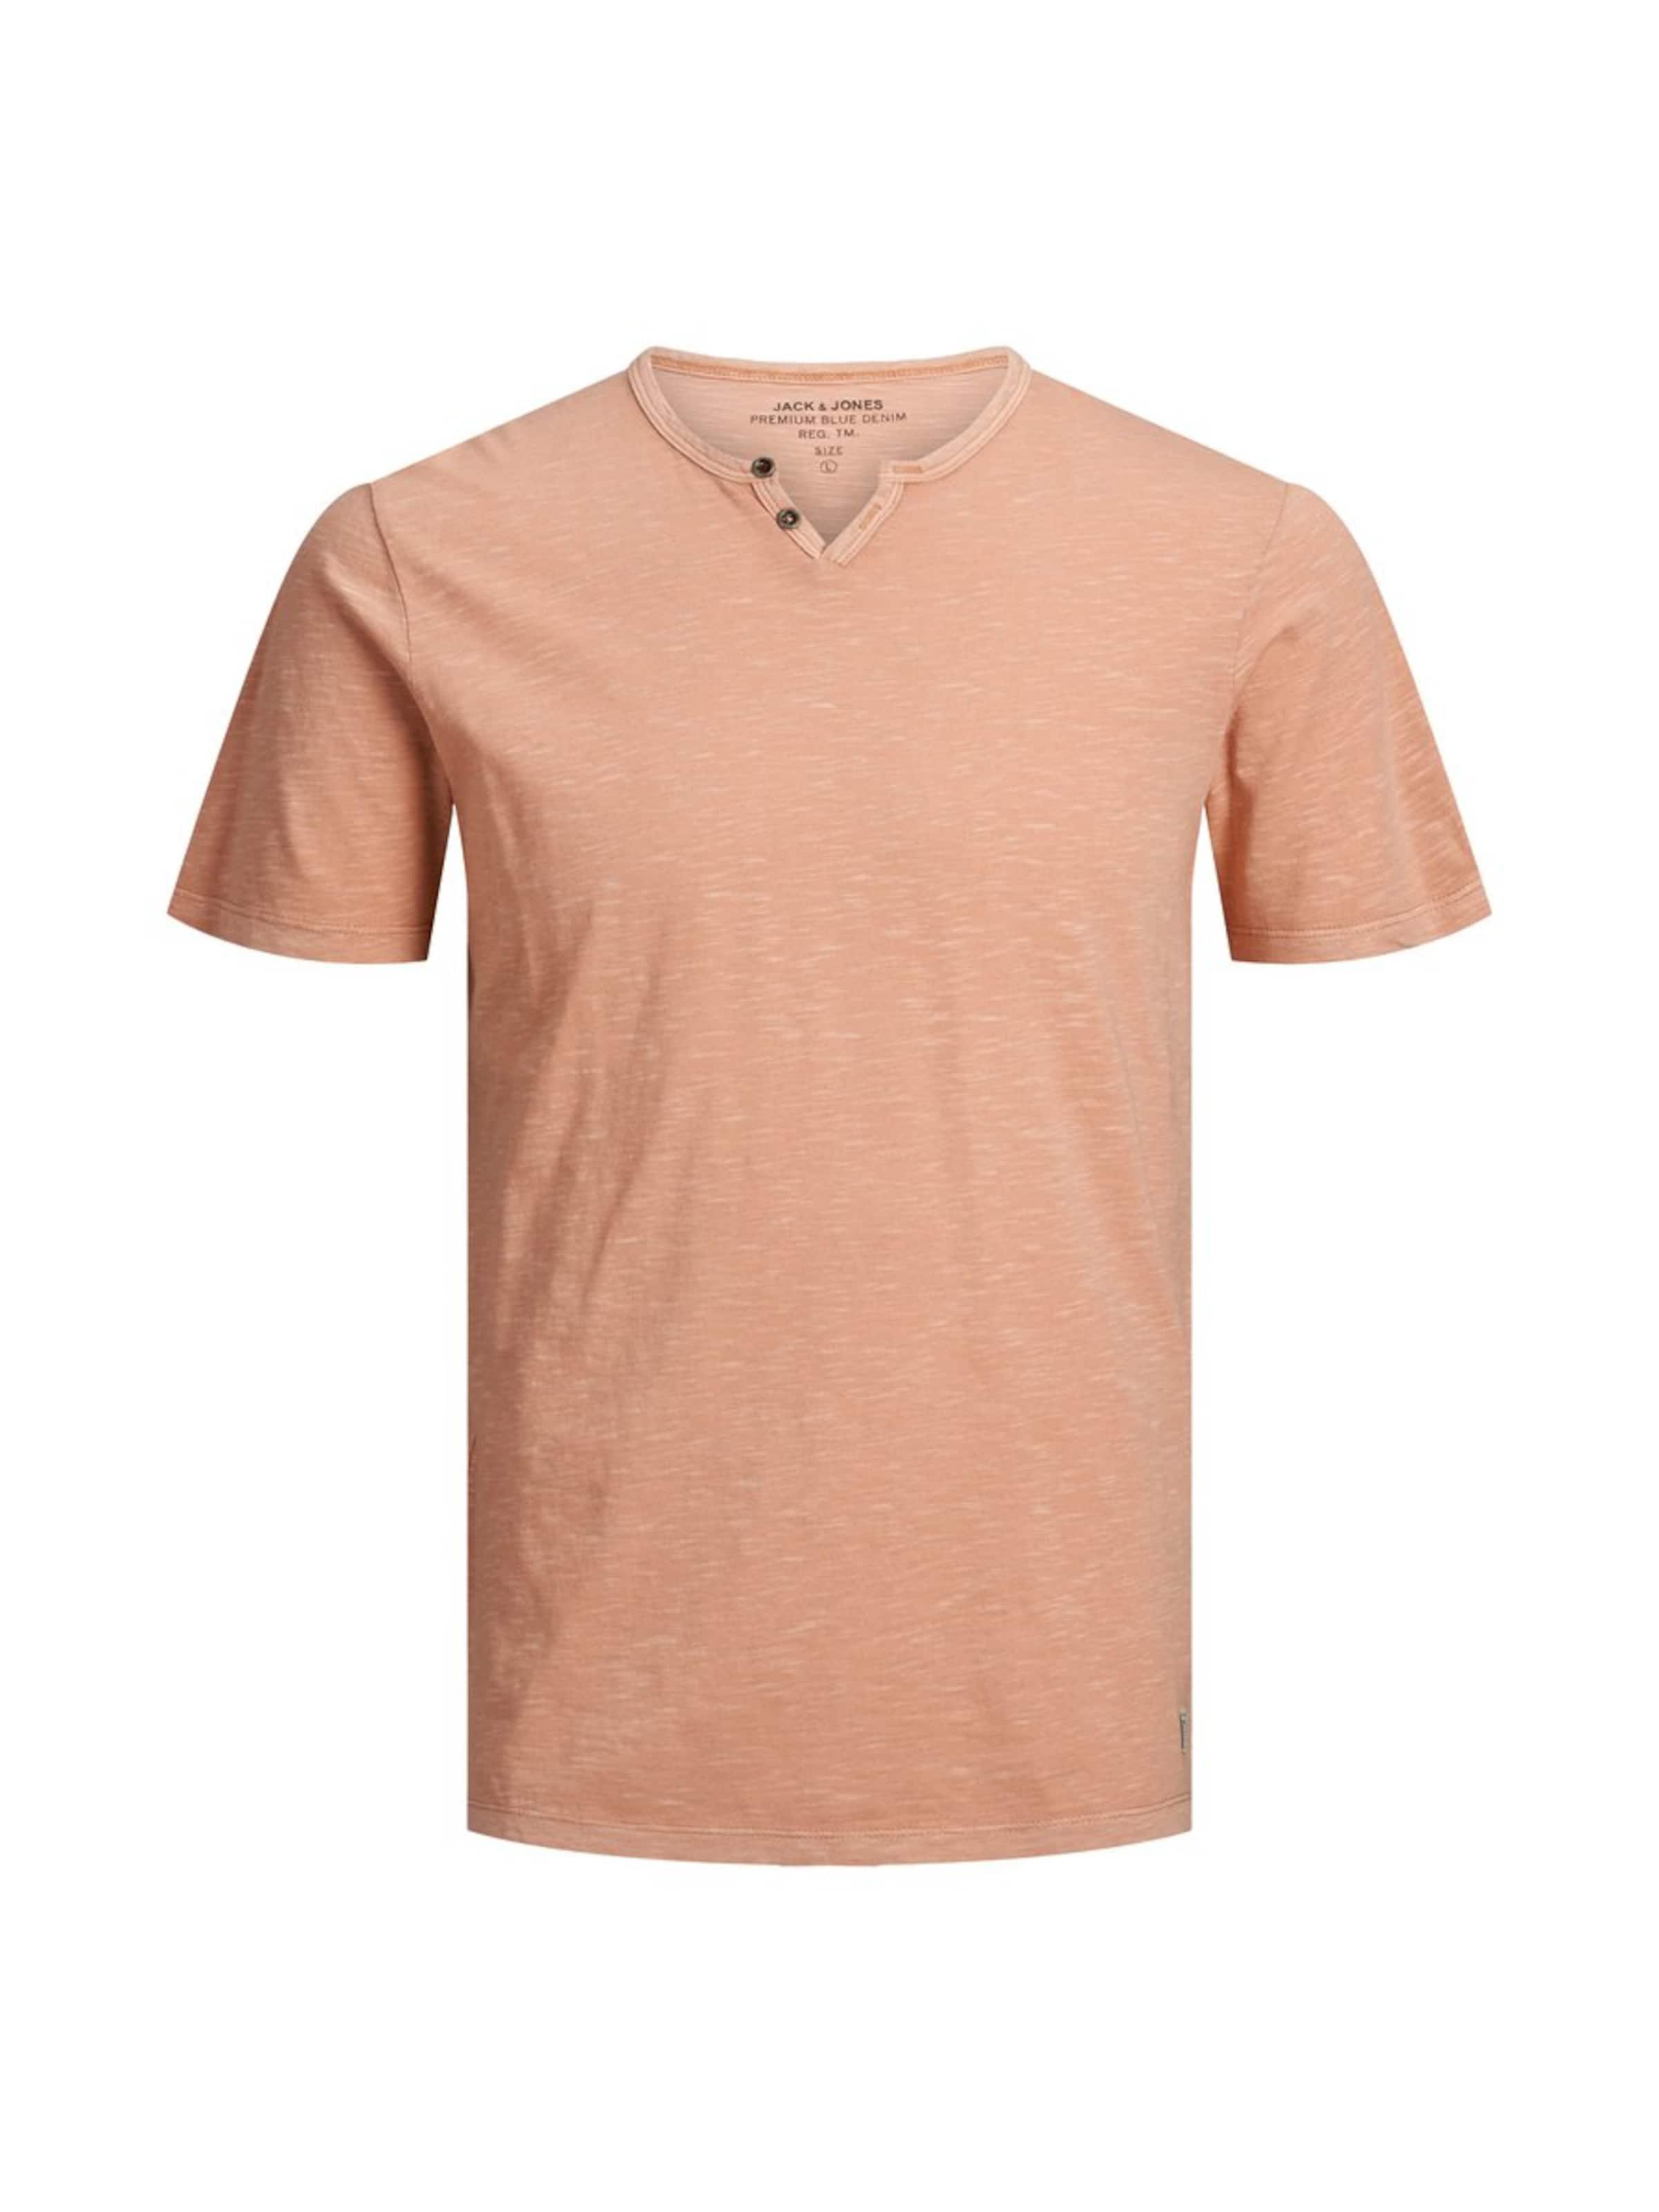 Ss Jones Neck' T 'jprbenjamin Split Tee En Jackamp; shirt Rouge Nv0wy8nmO